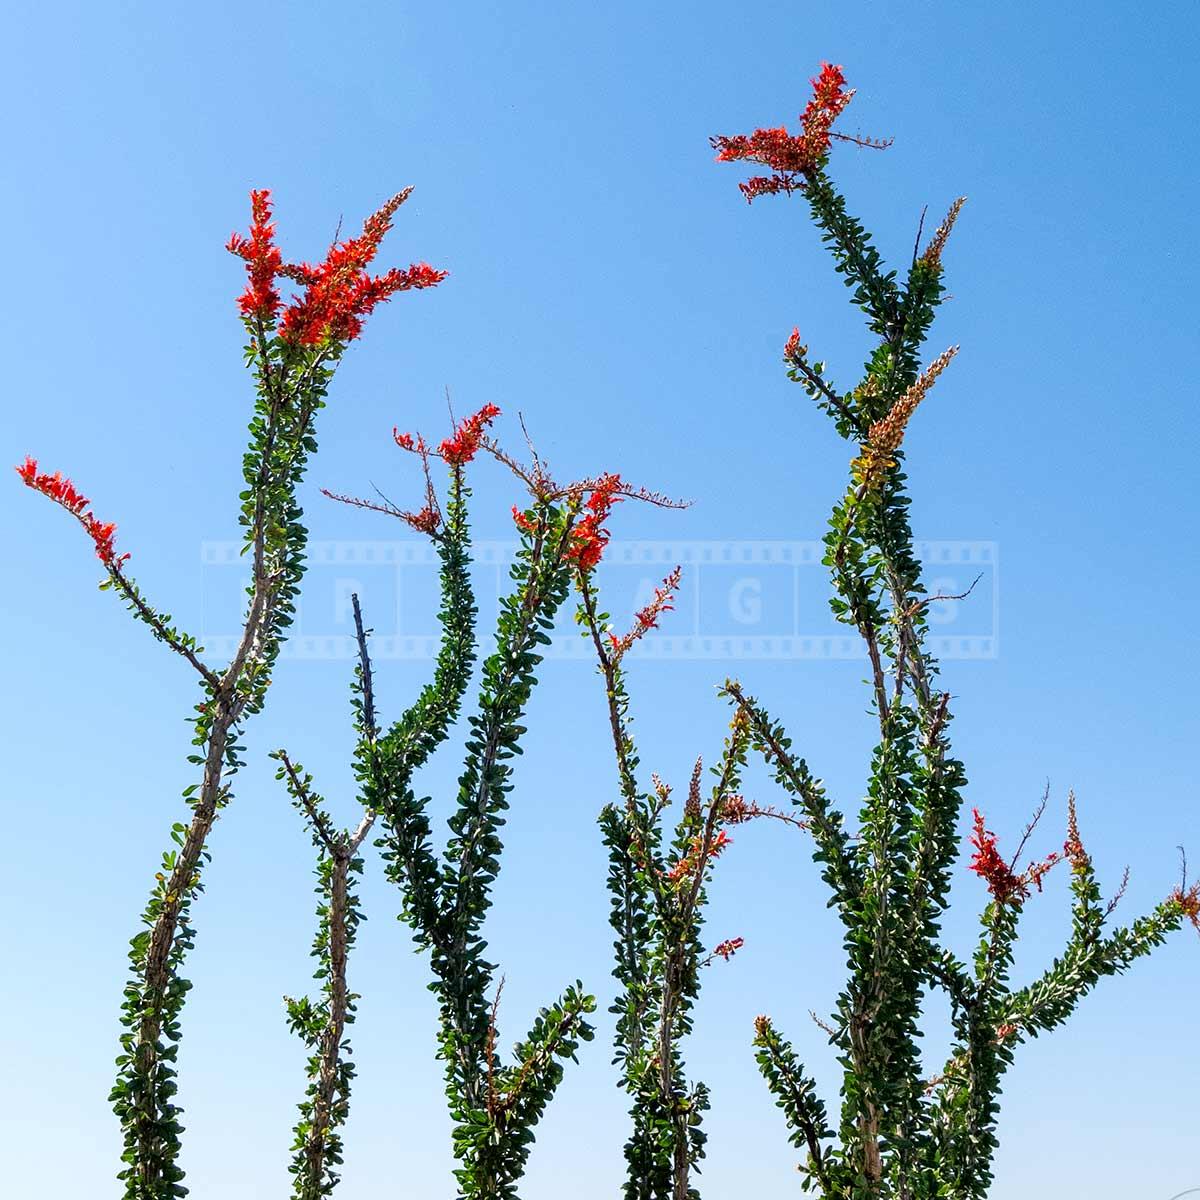 Ocotillo desert plant in bloom